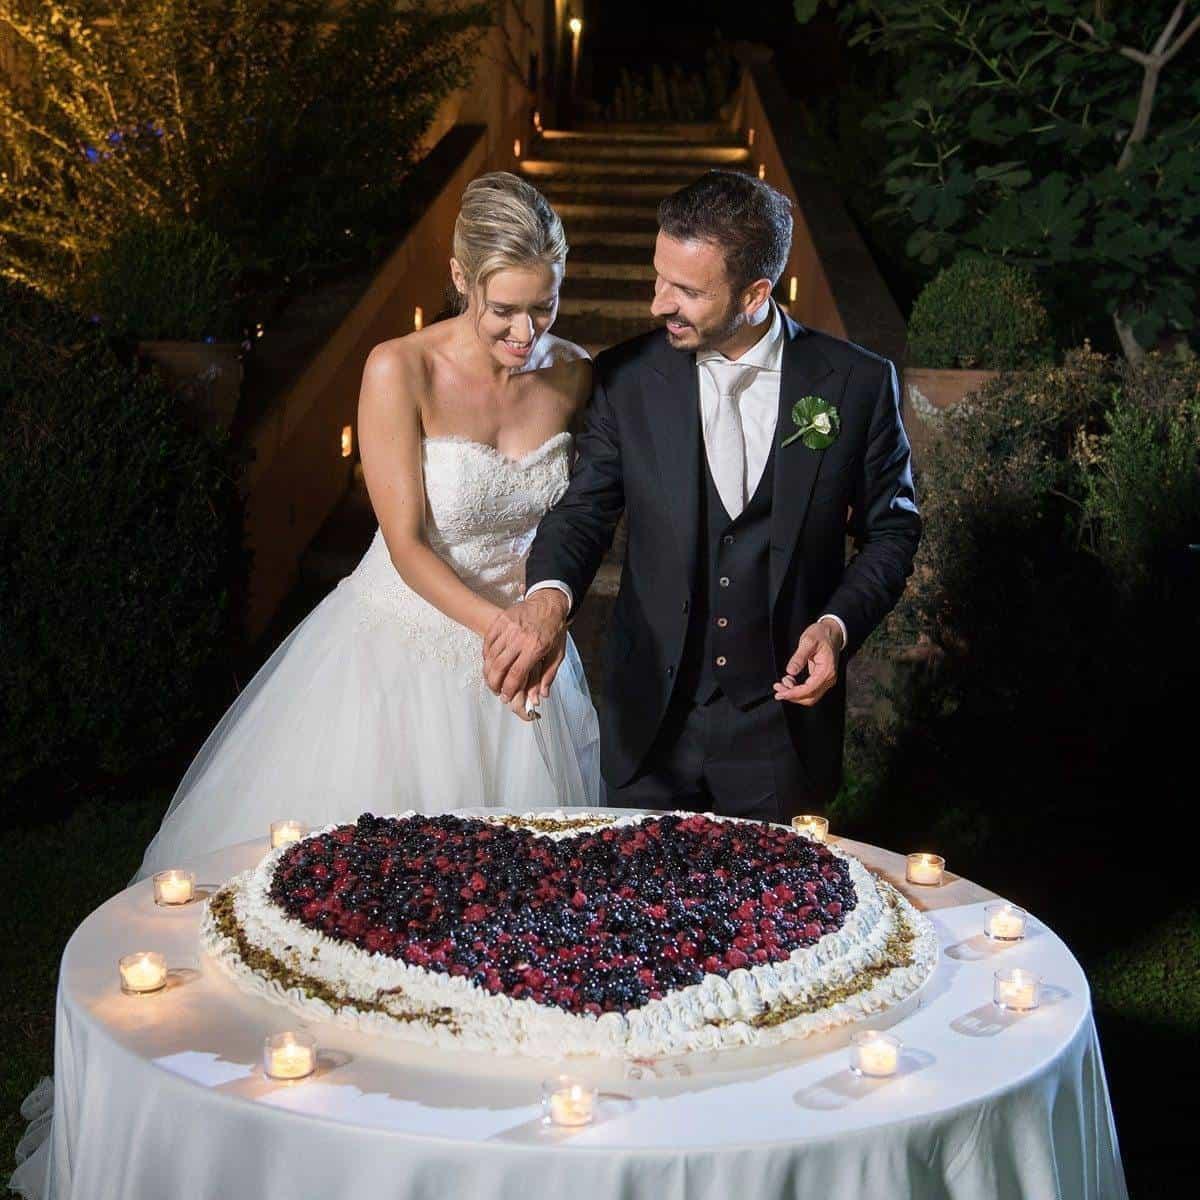 cake cut 1 - Luxury Wedding Gallery